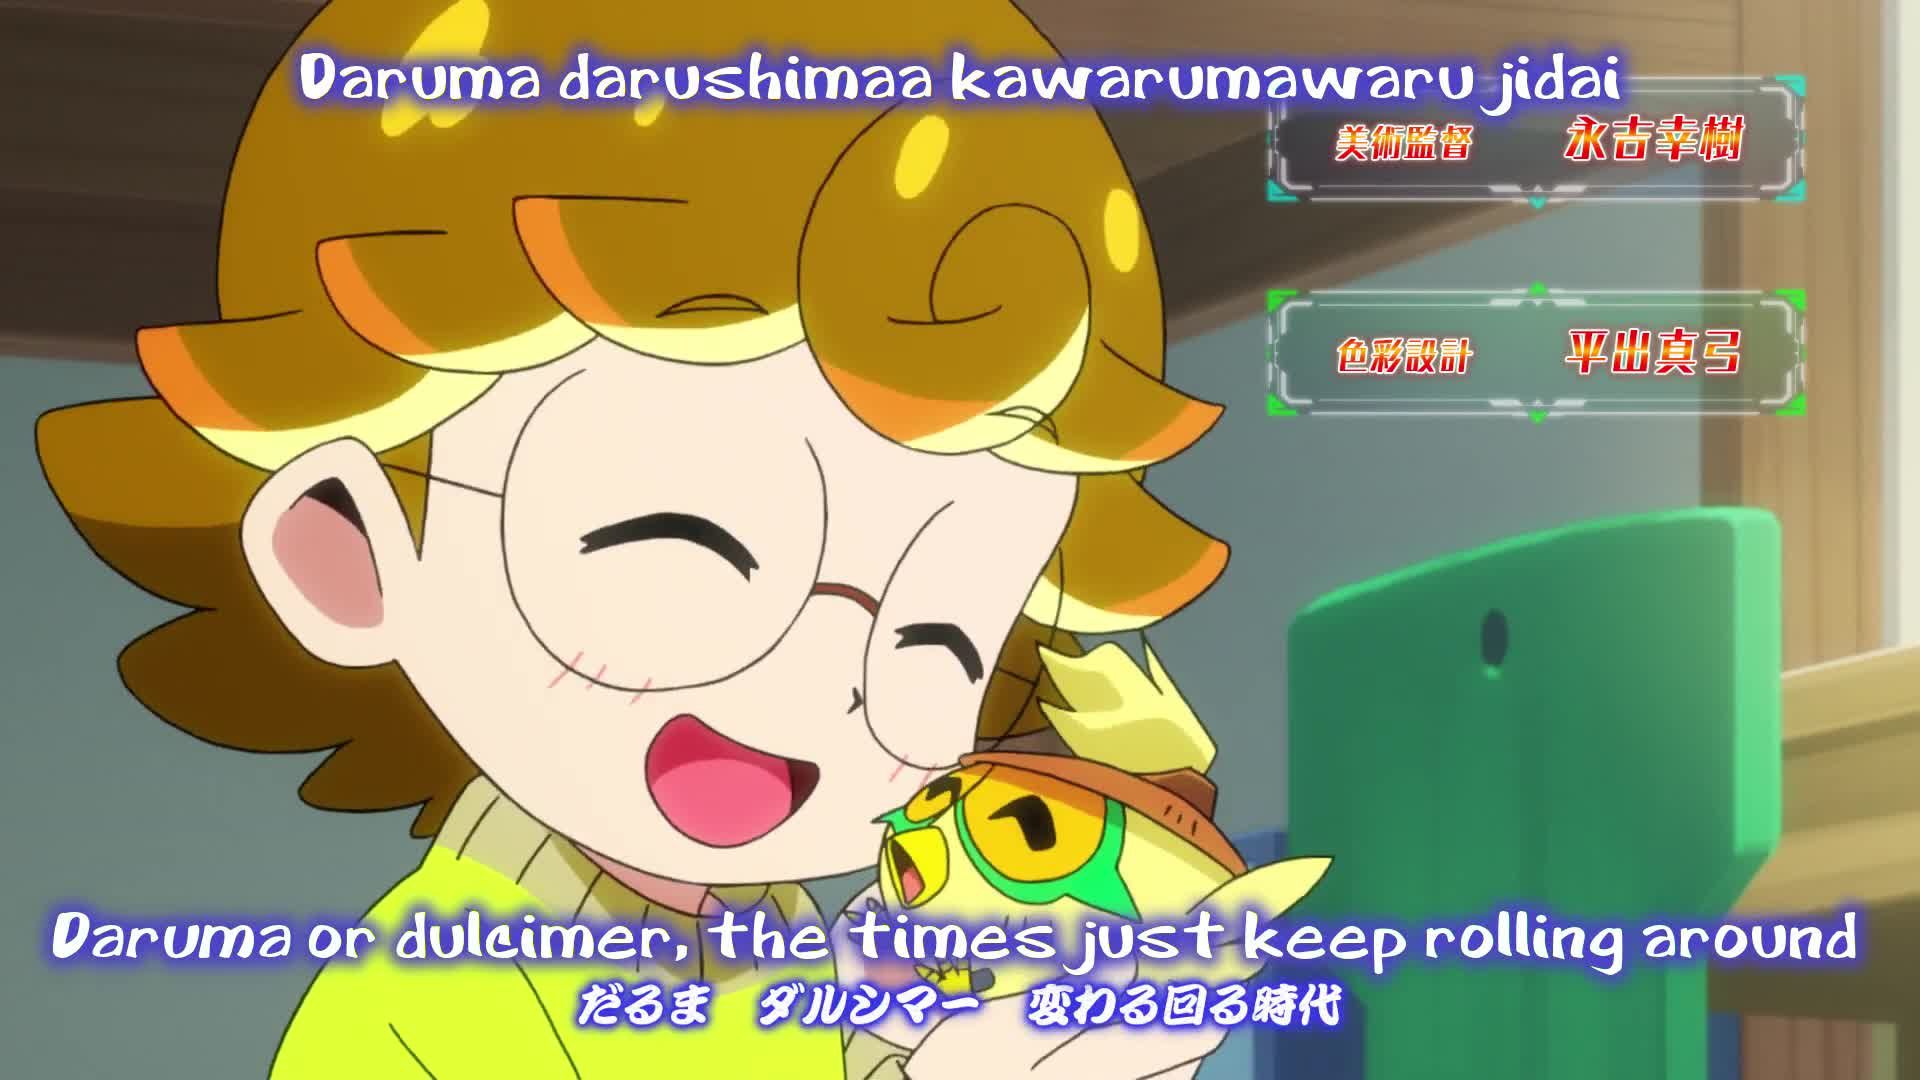 Saikyou Kamizmode!